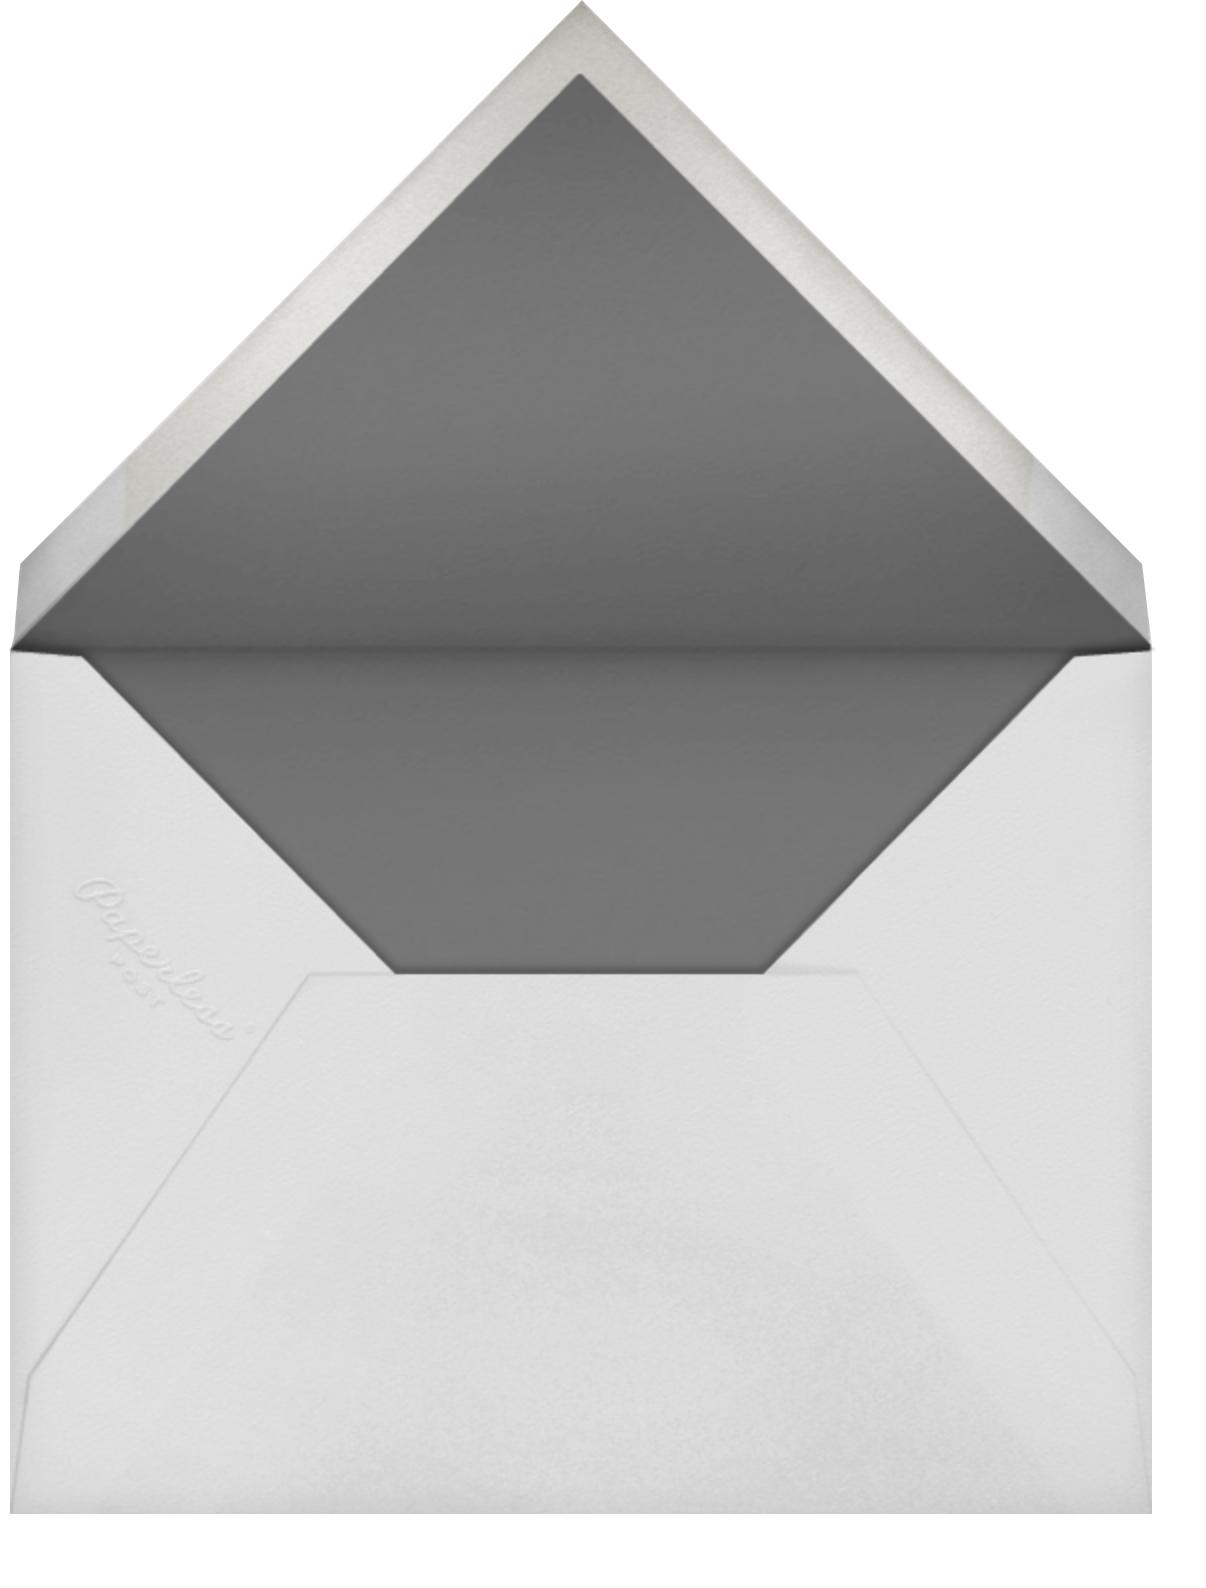 Bristle - Paperless Post - Memorial service - envelope back